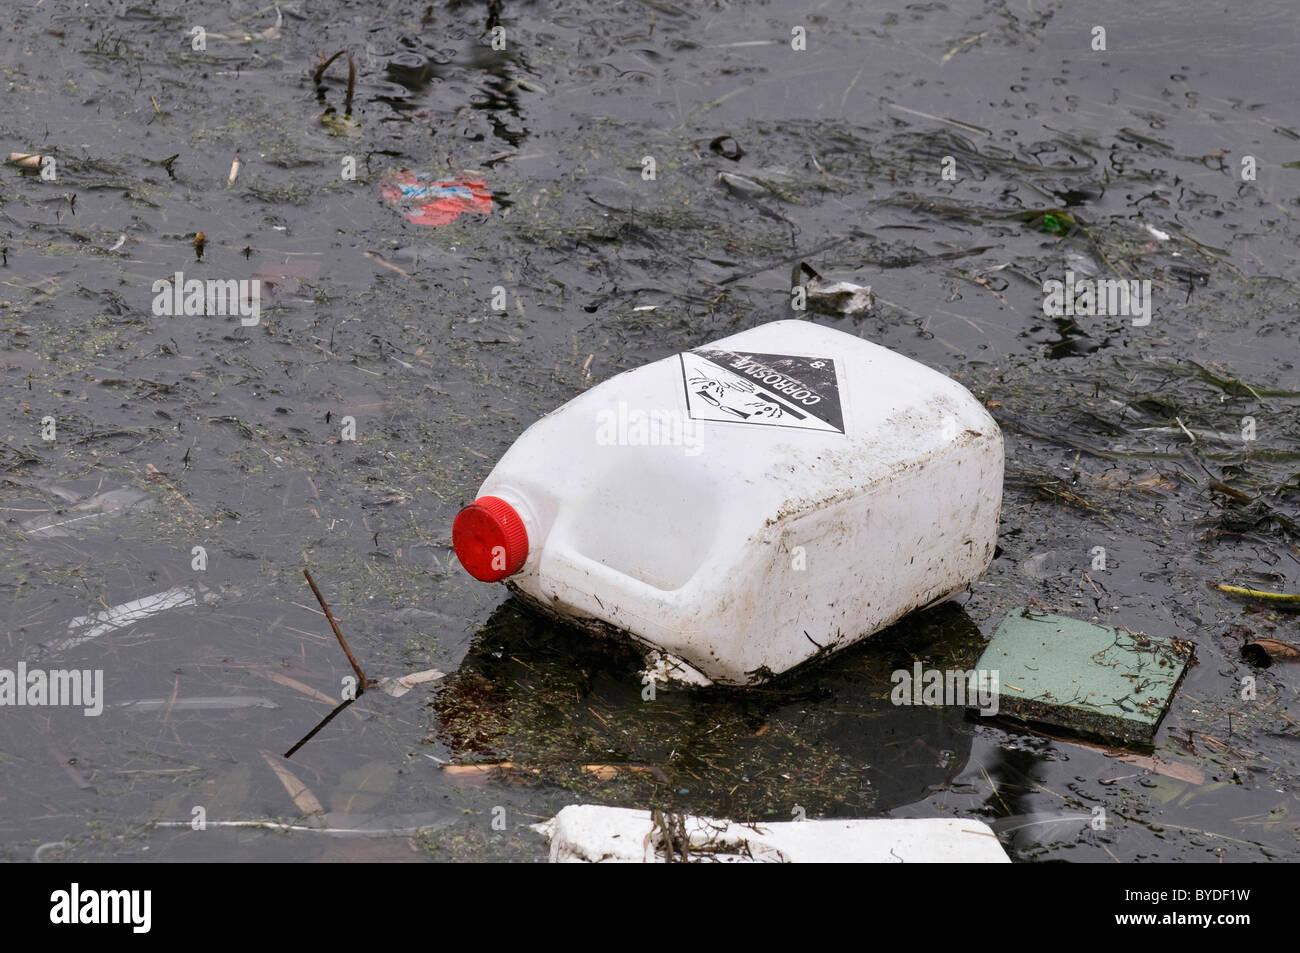 Agua Sucia, vieja botella con sustancias corrosivas flotando sobre película sucia Imagen De Stock